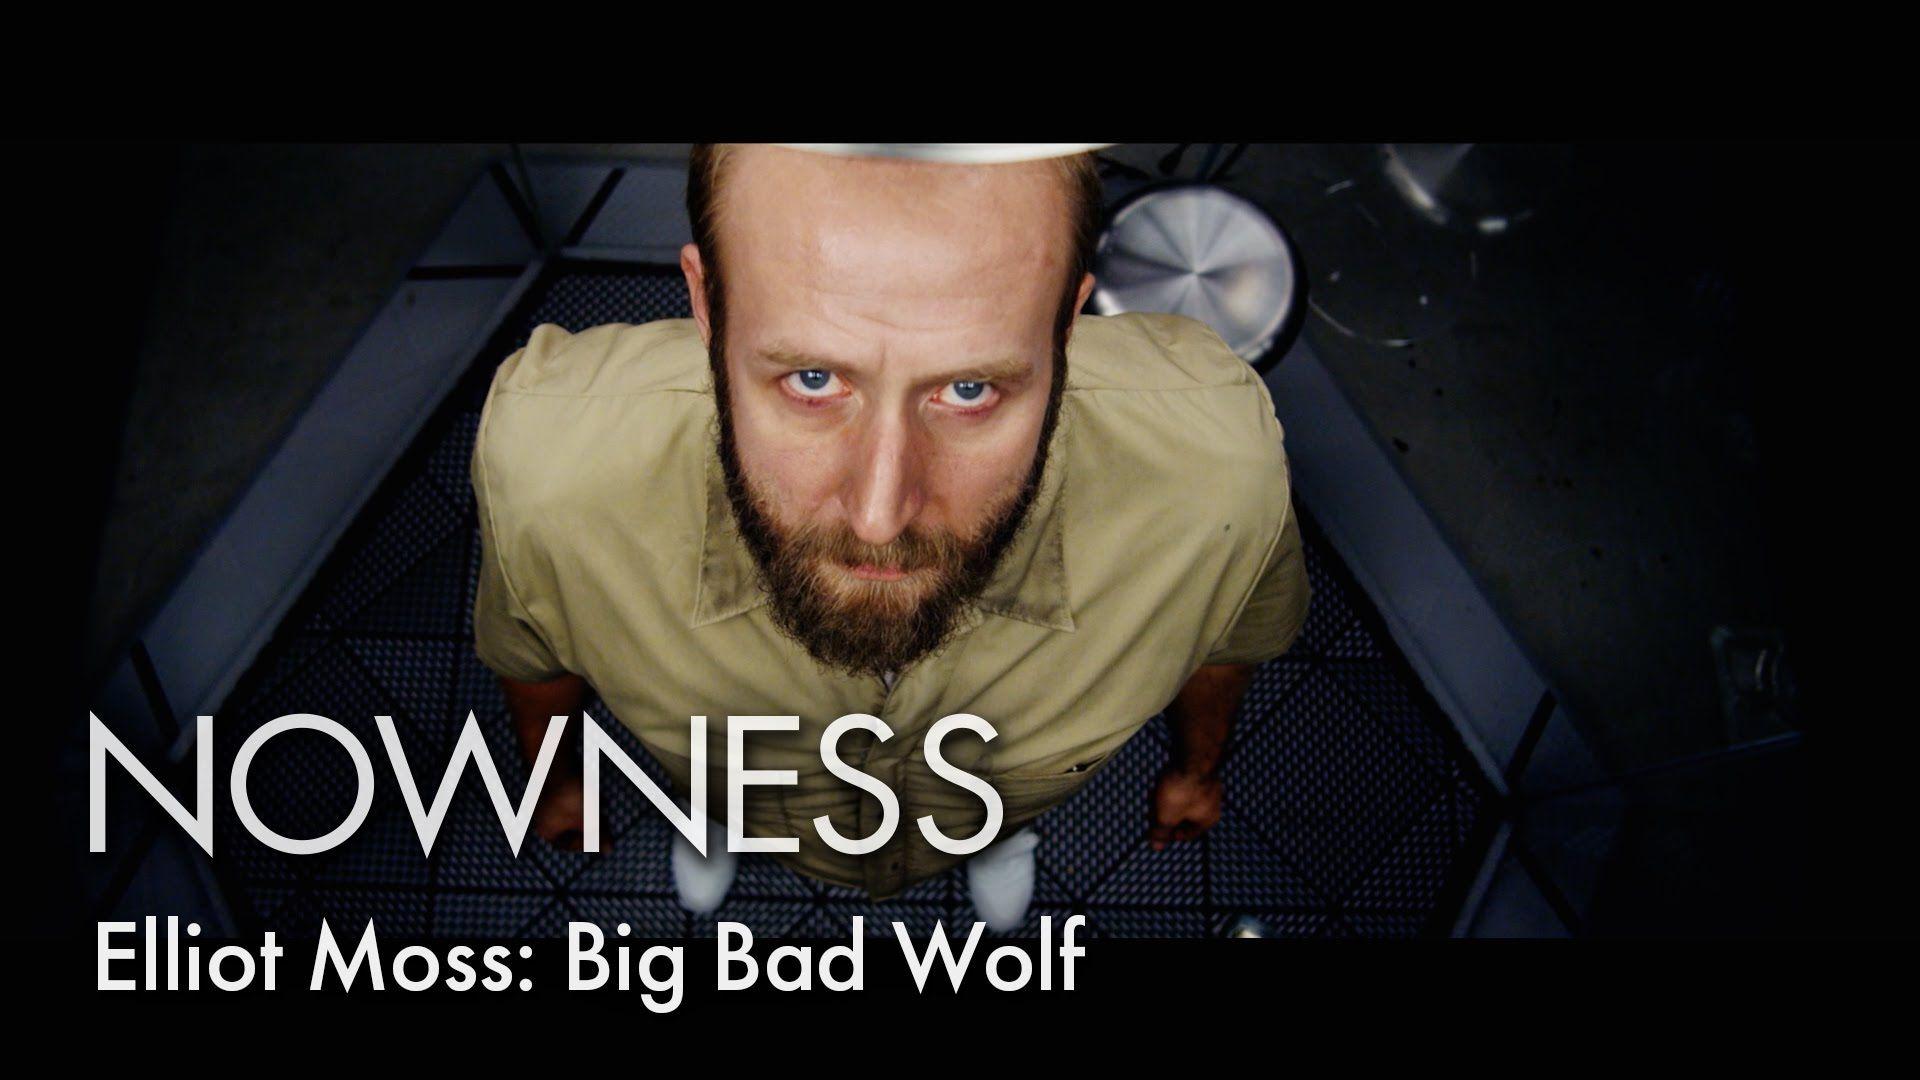 Elliot Moss: Big Bad Wolf (Official Video)